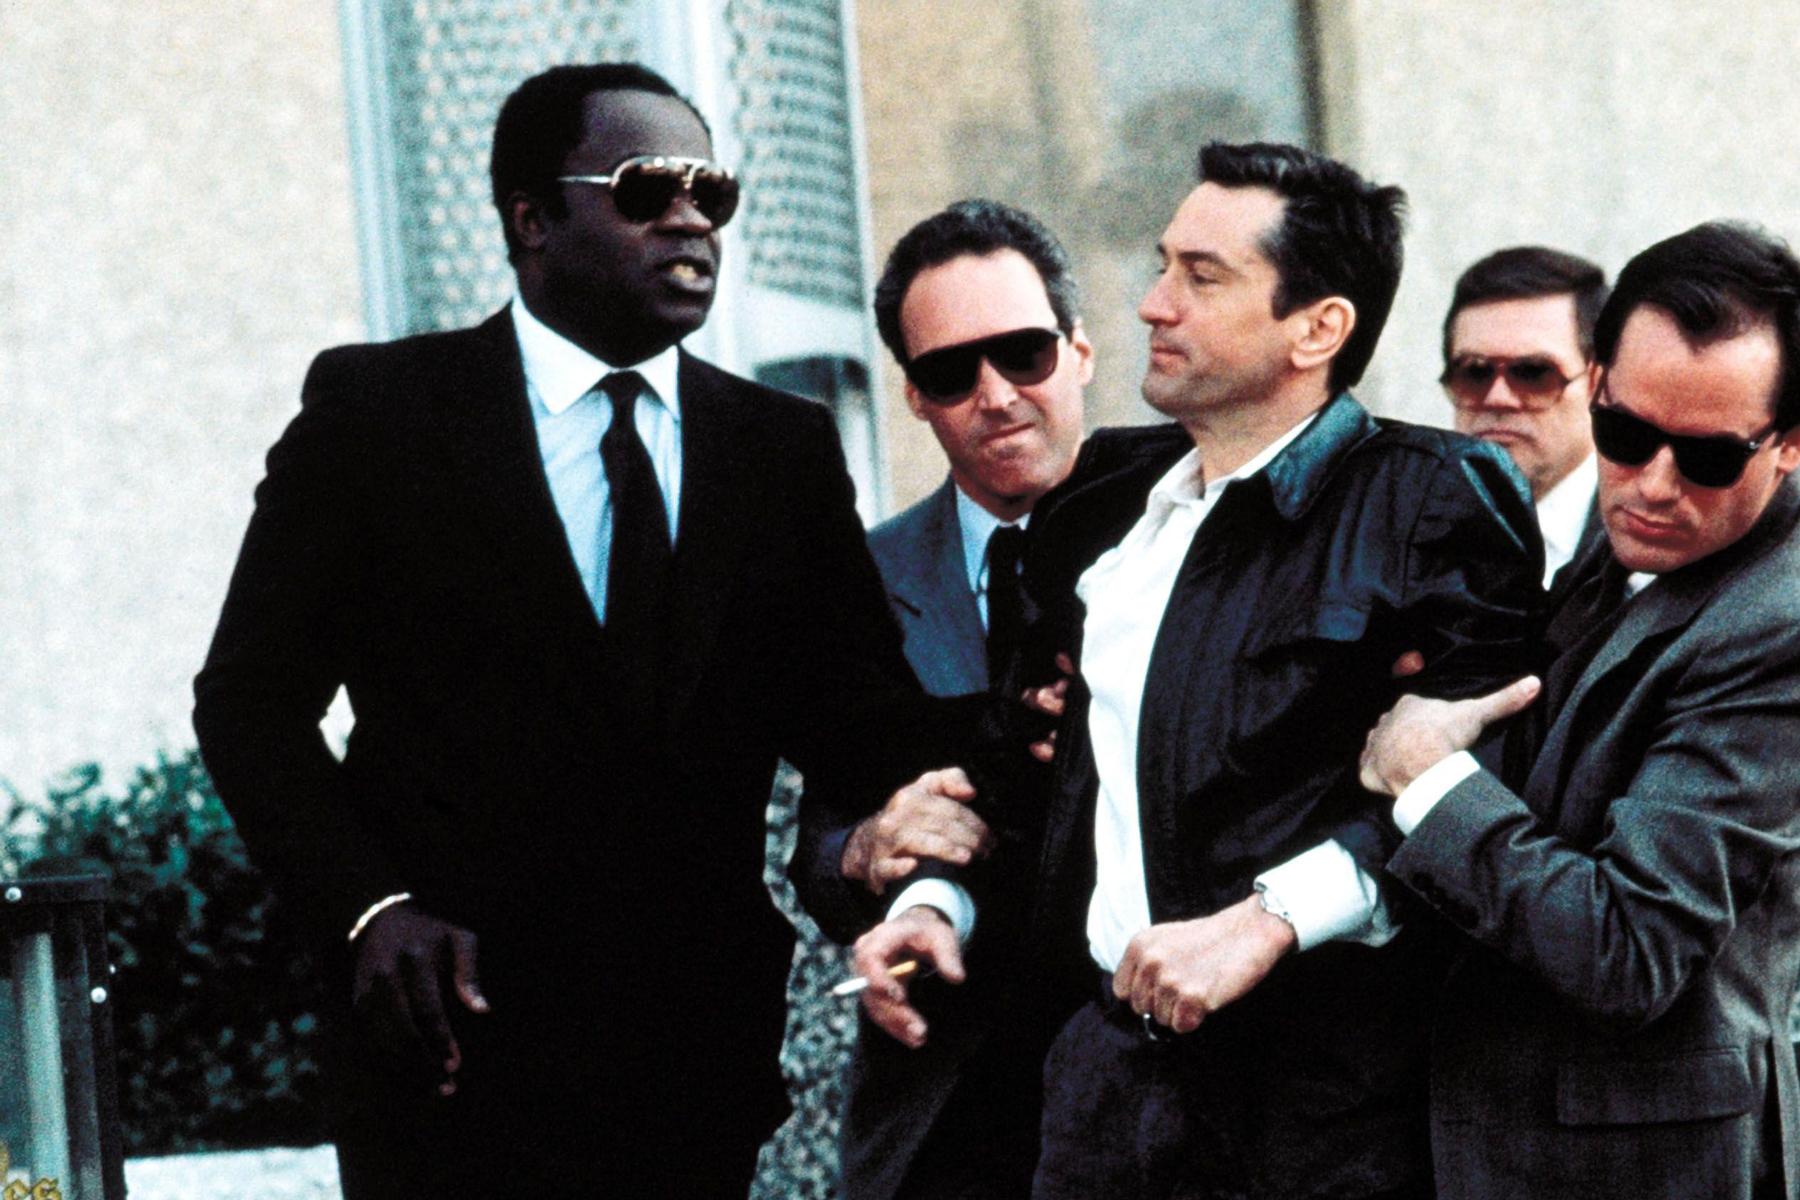 P1A703 Original Film Title: MIDNIGHT RUN. English Title: MIDNIGHT RUN. Film Director: MARTIN BREST. Year: 1988. Stars: ROBERT DE NIRO. Credit: UNIVERSAL PICTURES / Album